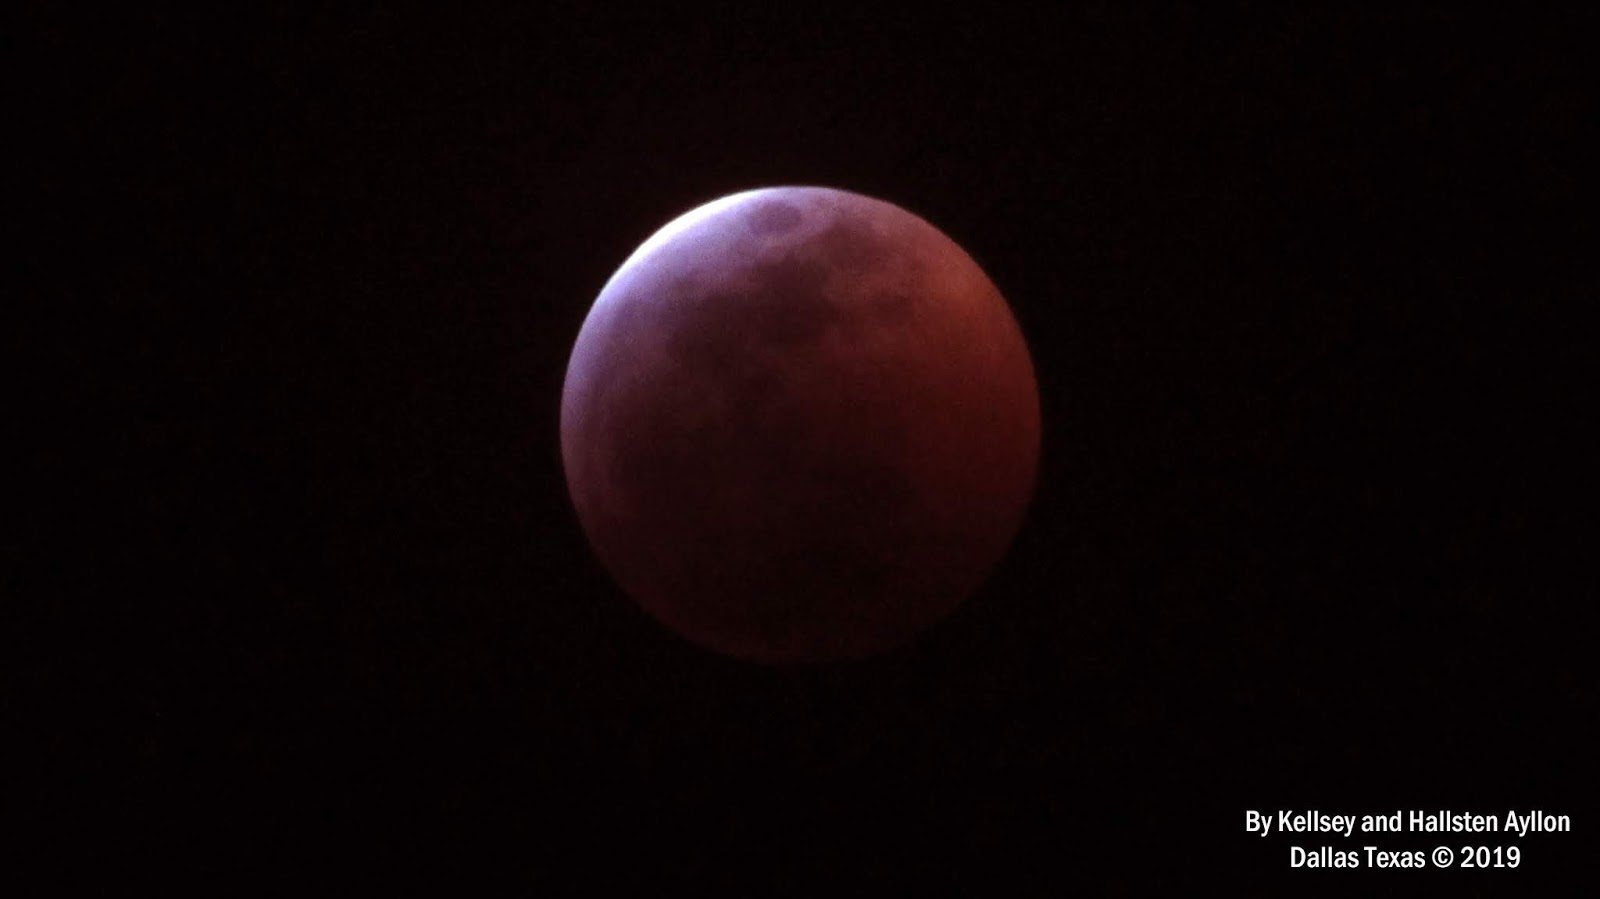 blood moon january 2019 dallas tx - photo #13